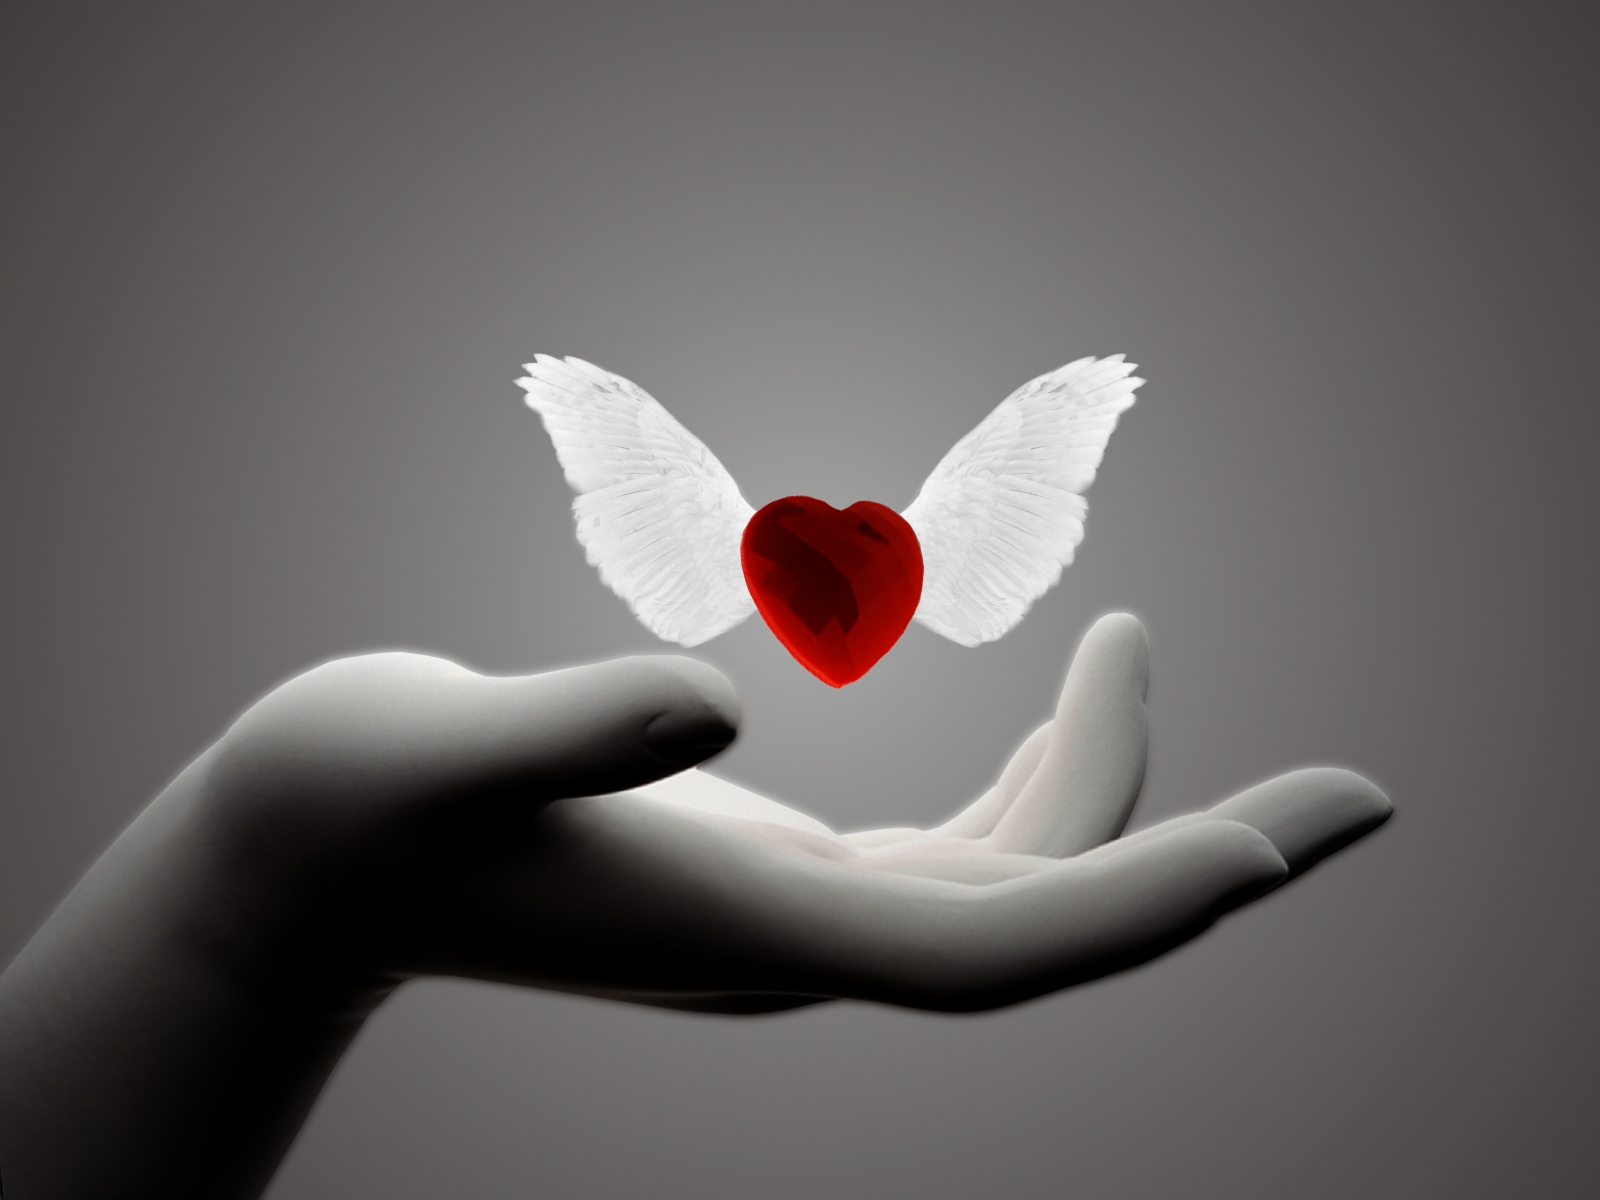 http://blogs.sch.gr/lykchrys/files/2014/04/love_hearting.jpg